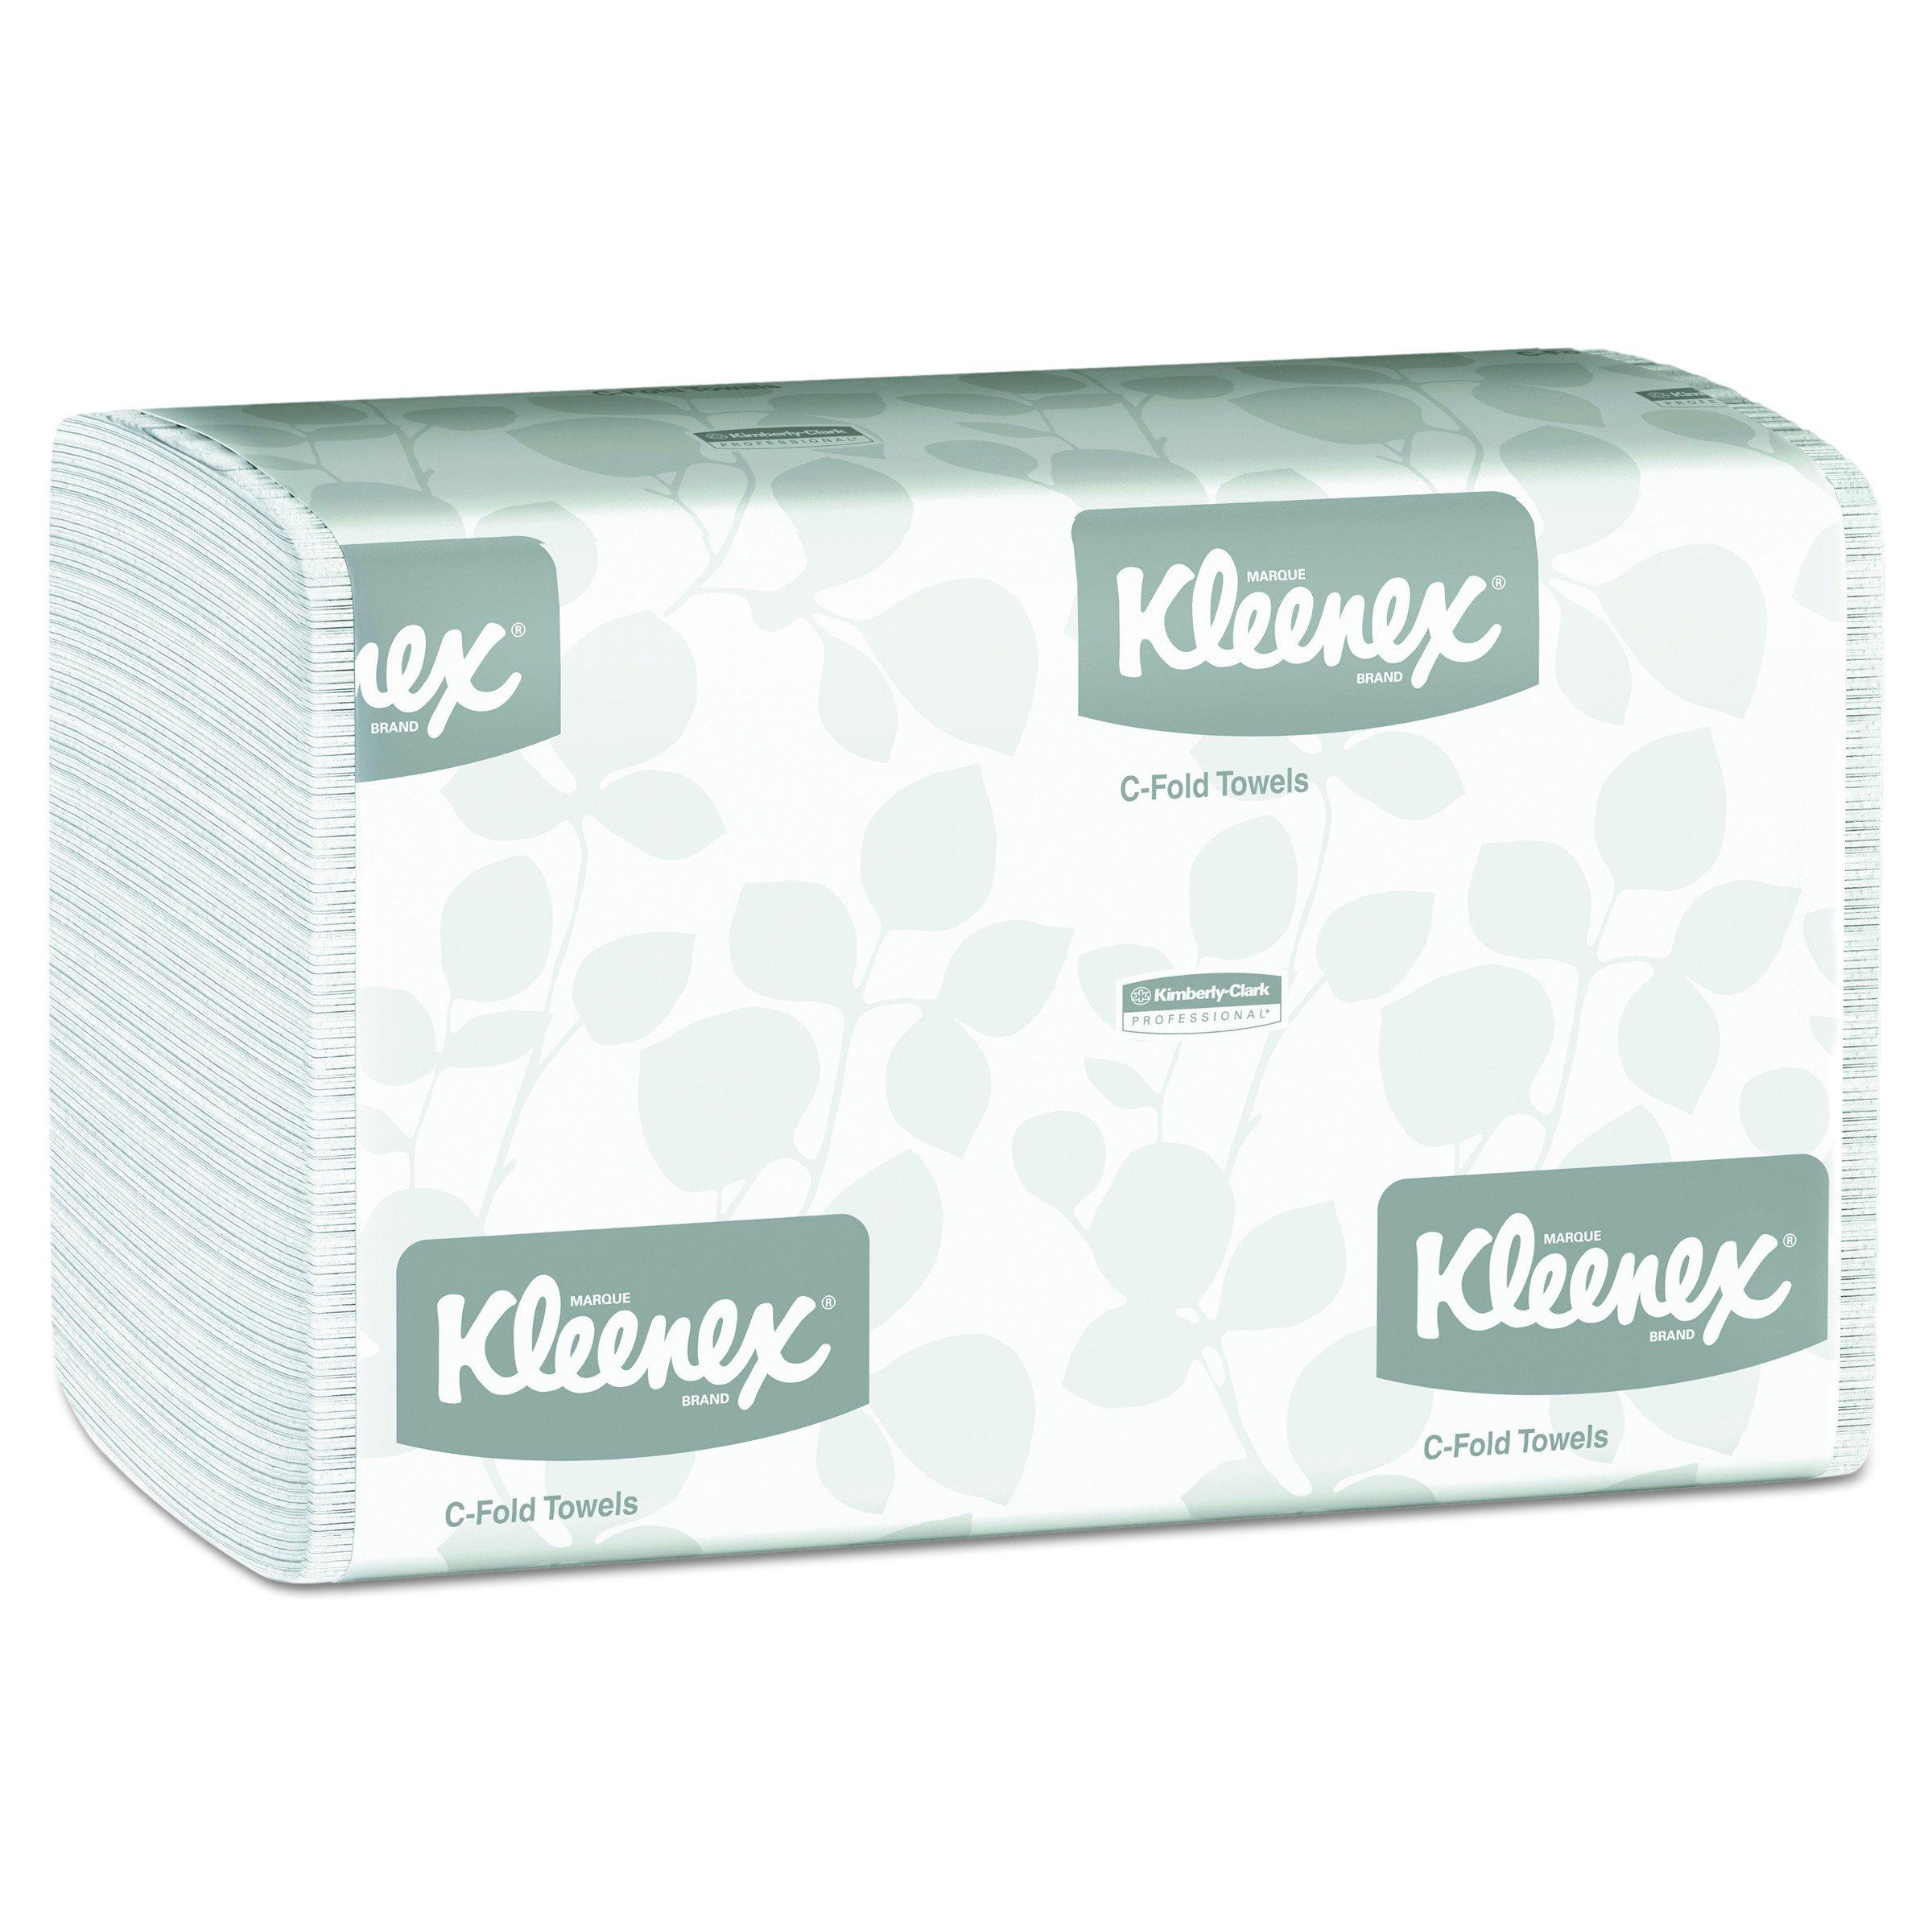 Kleenex 01500 C-Fold Paper Towels, 10 1/8 x 13 3/20, White, 150 per Pack (Case of 16 Packs)